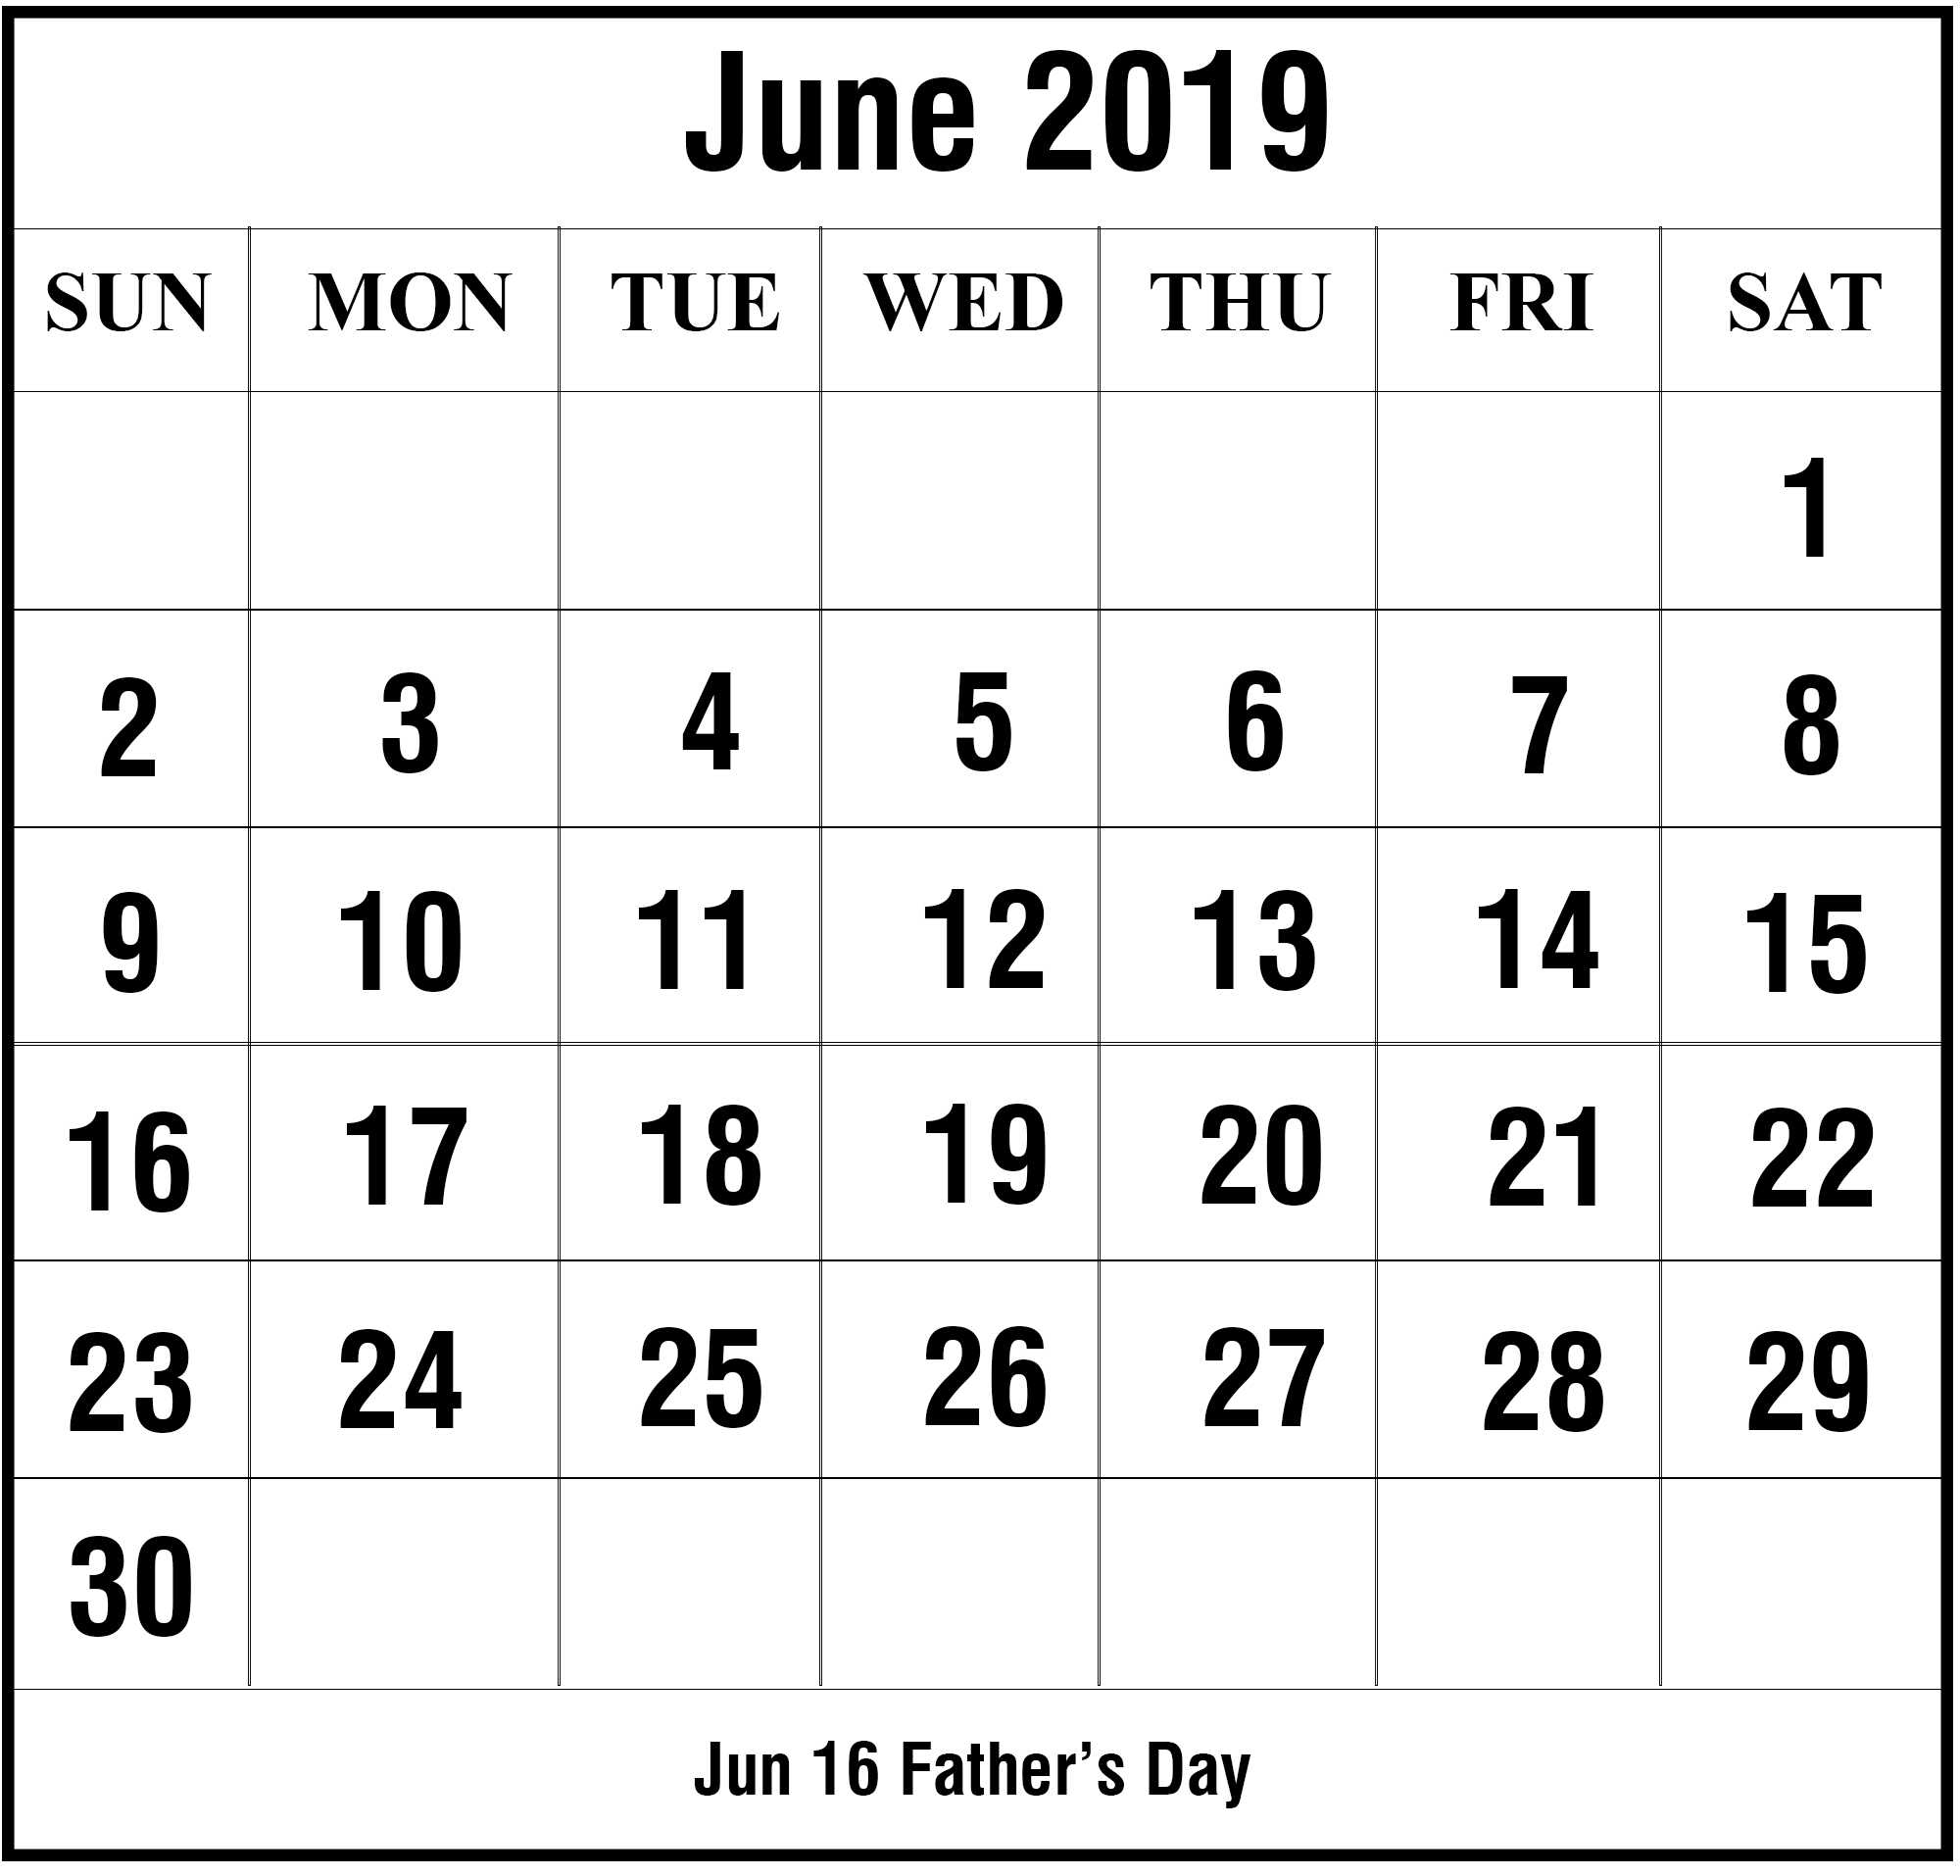 Free Printable June 2019 Calendar Templates [Pdf,word,excel